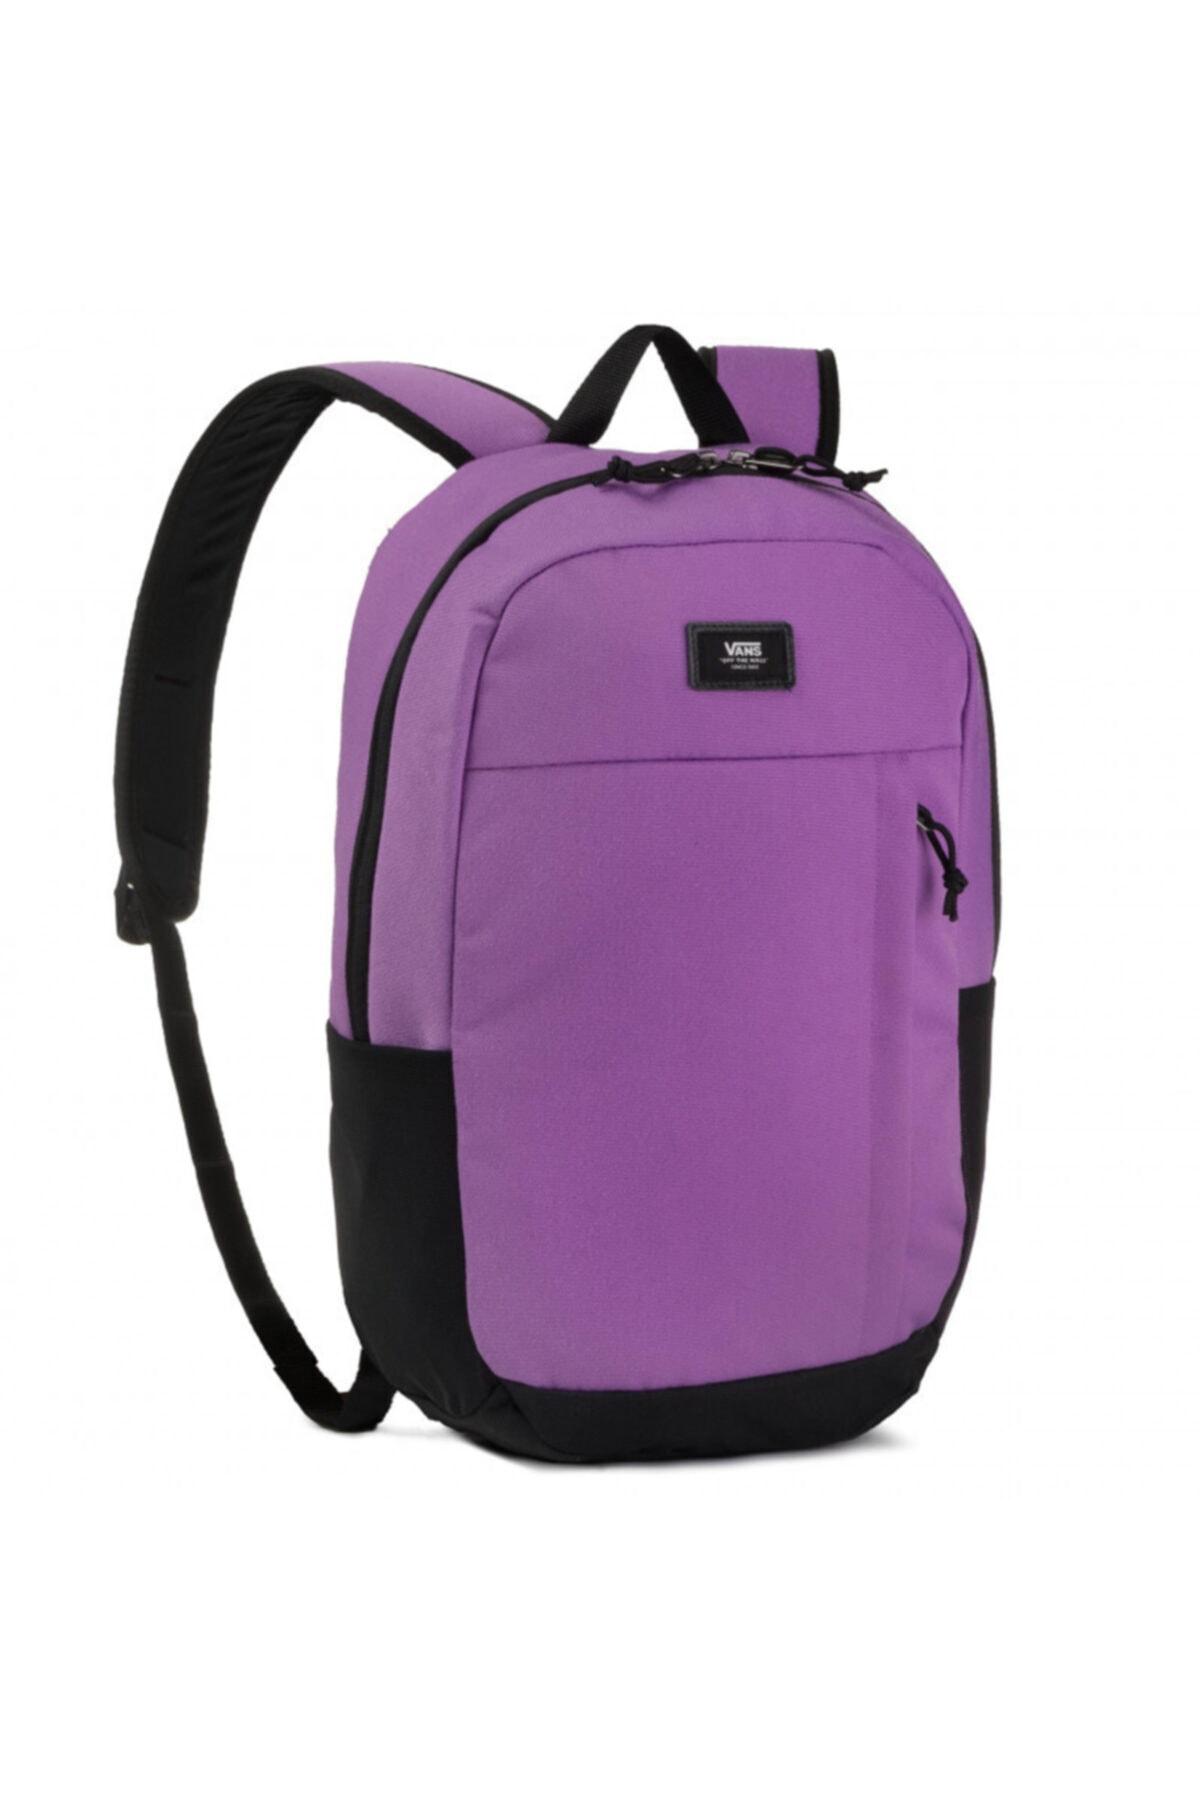 Vans Disorder Backpack Erkek Mor Sırt Çantası Vn0a3ı68zua1 1